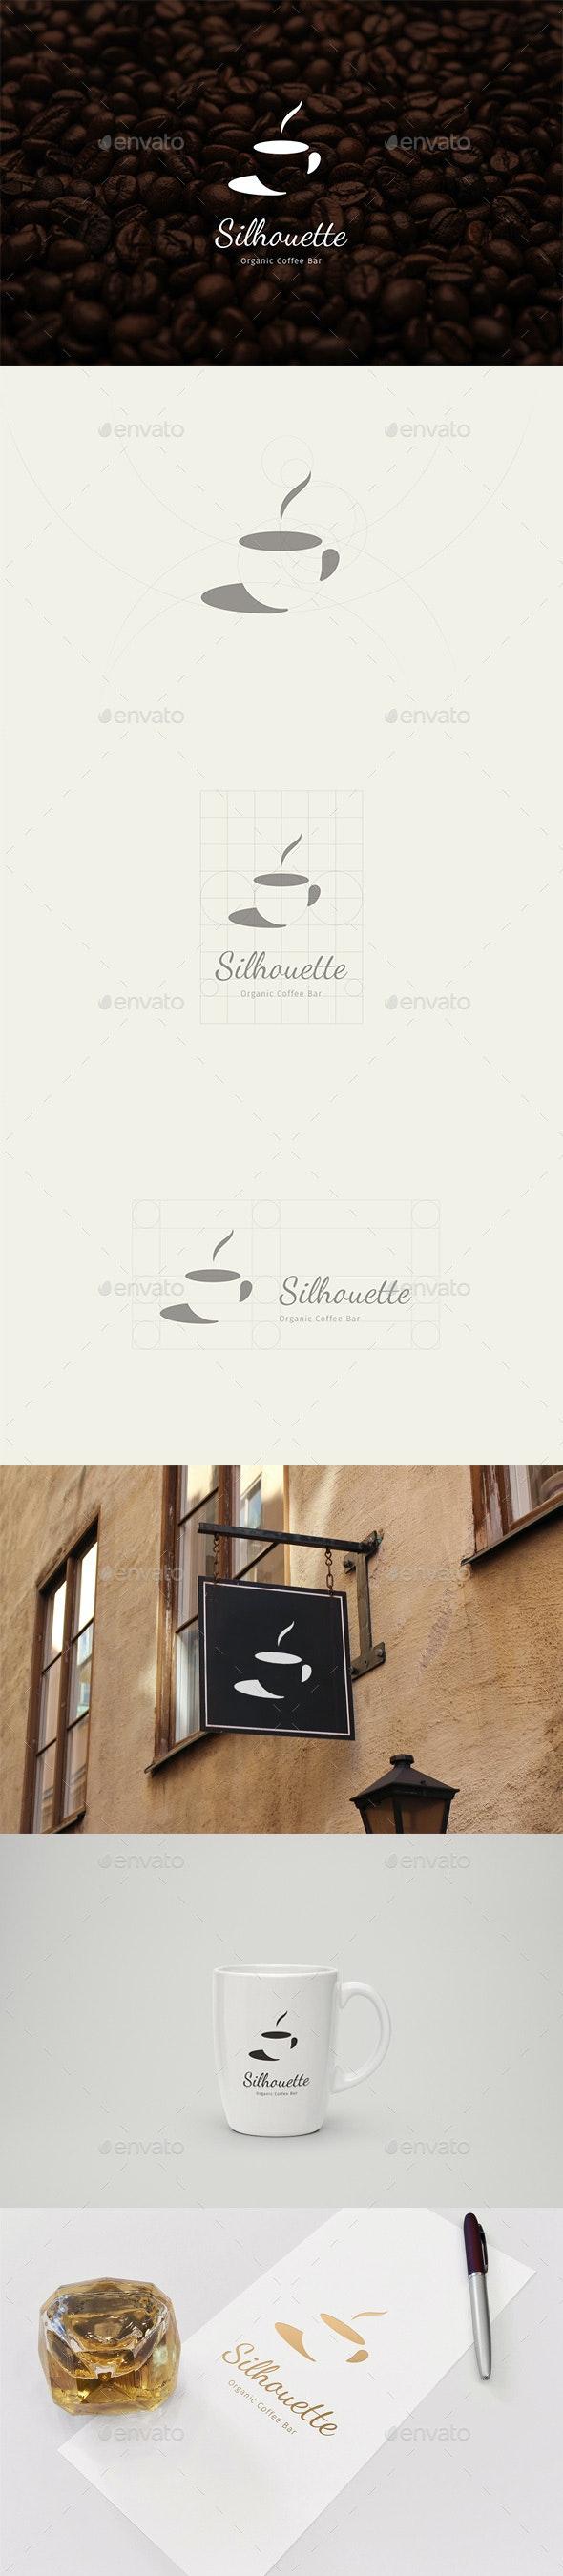 Silhouette Organic Coffee Bar Logo - Food Logo Templates